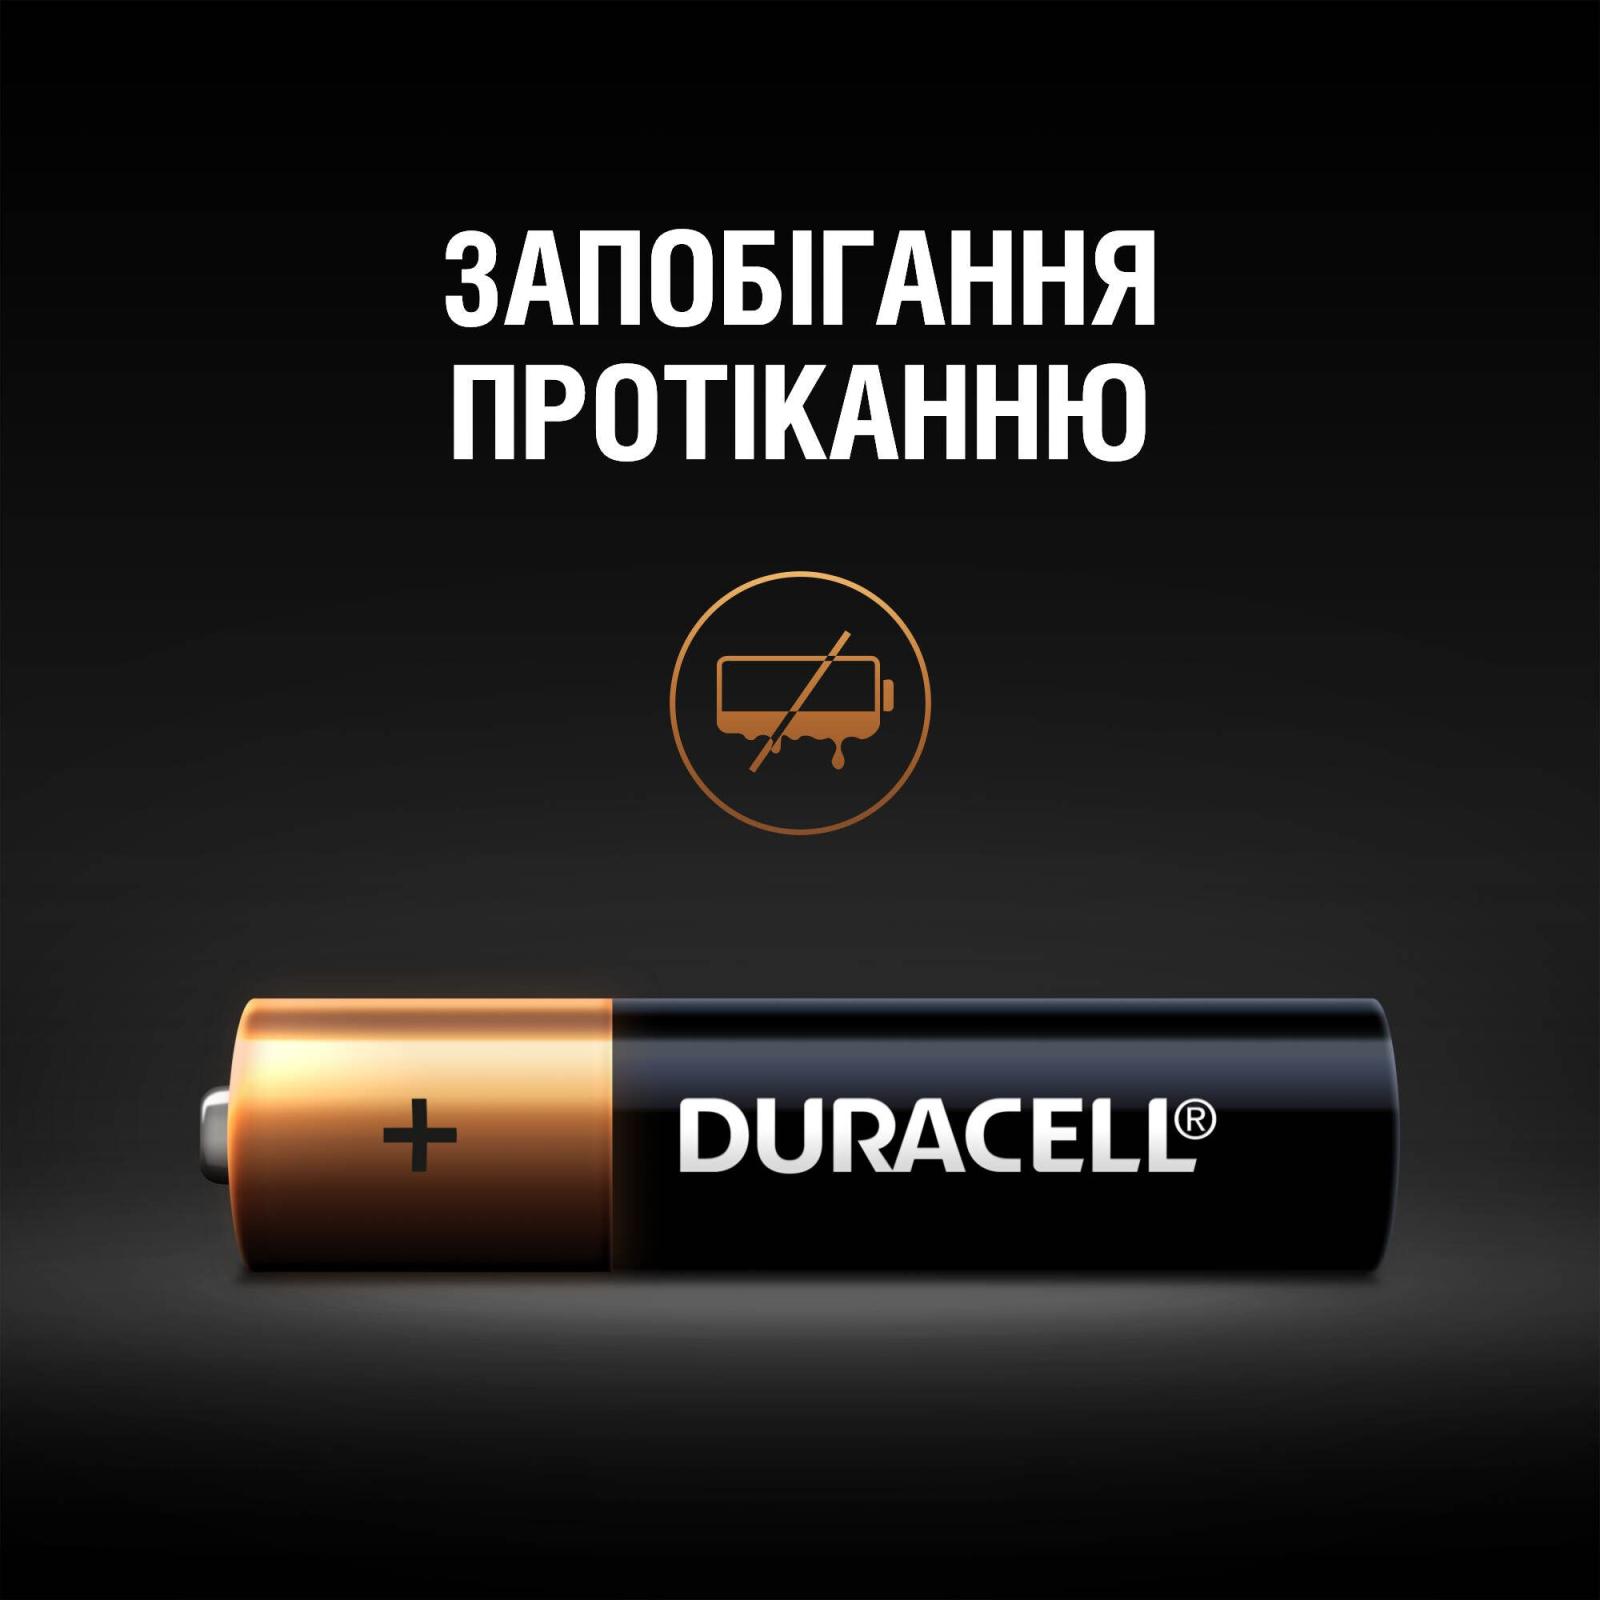 Батарейка Duracell AAA MN2400 LR03 * 12 (5000394109254 / 81545432) изображение 6